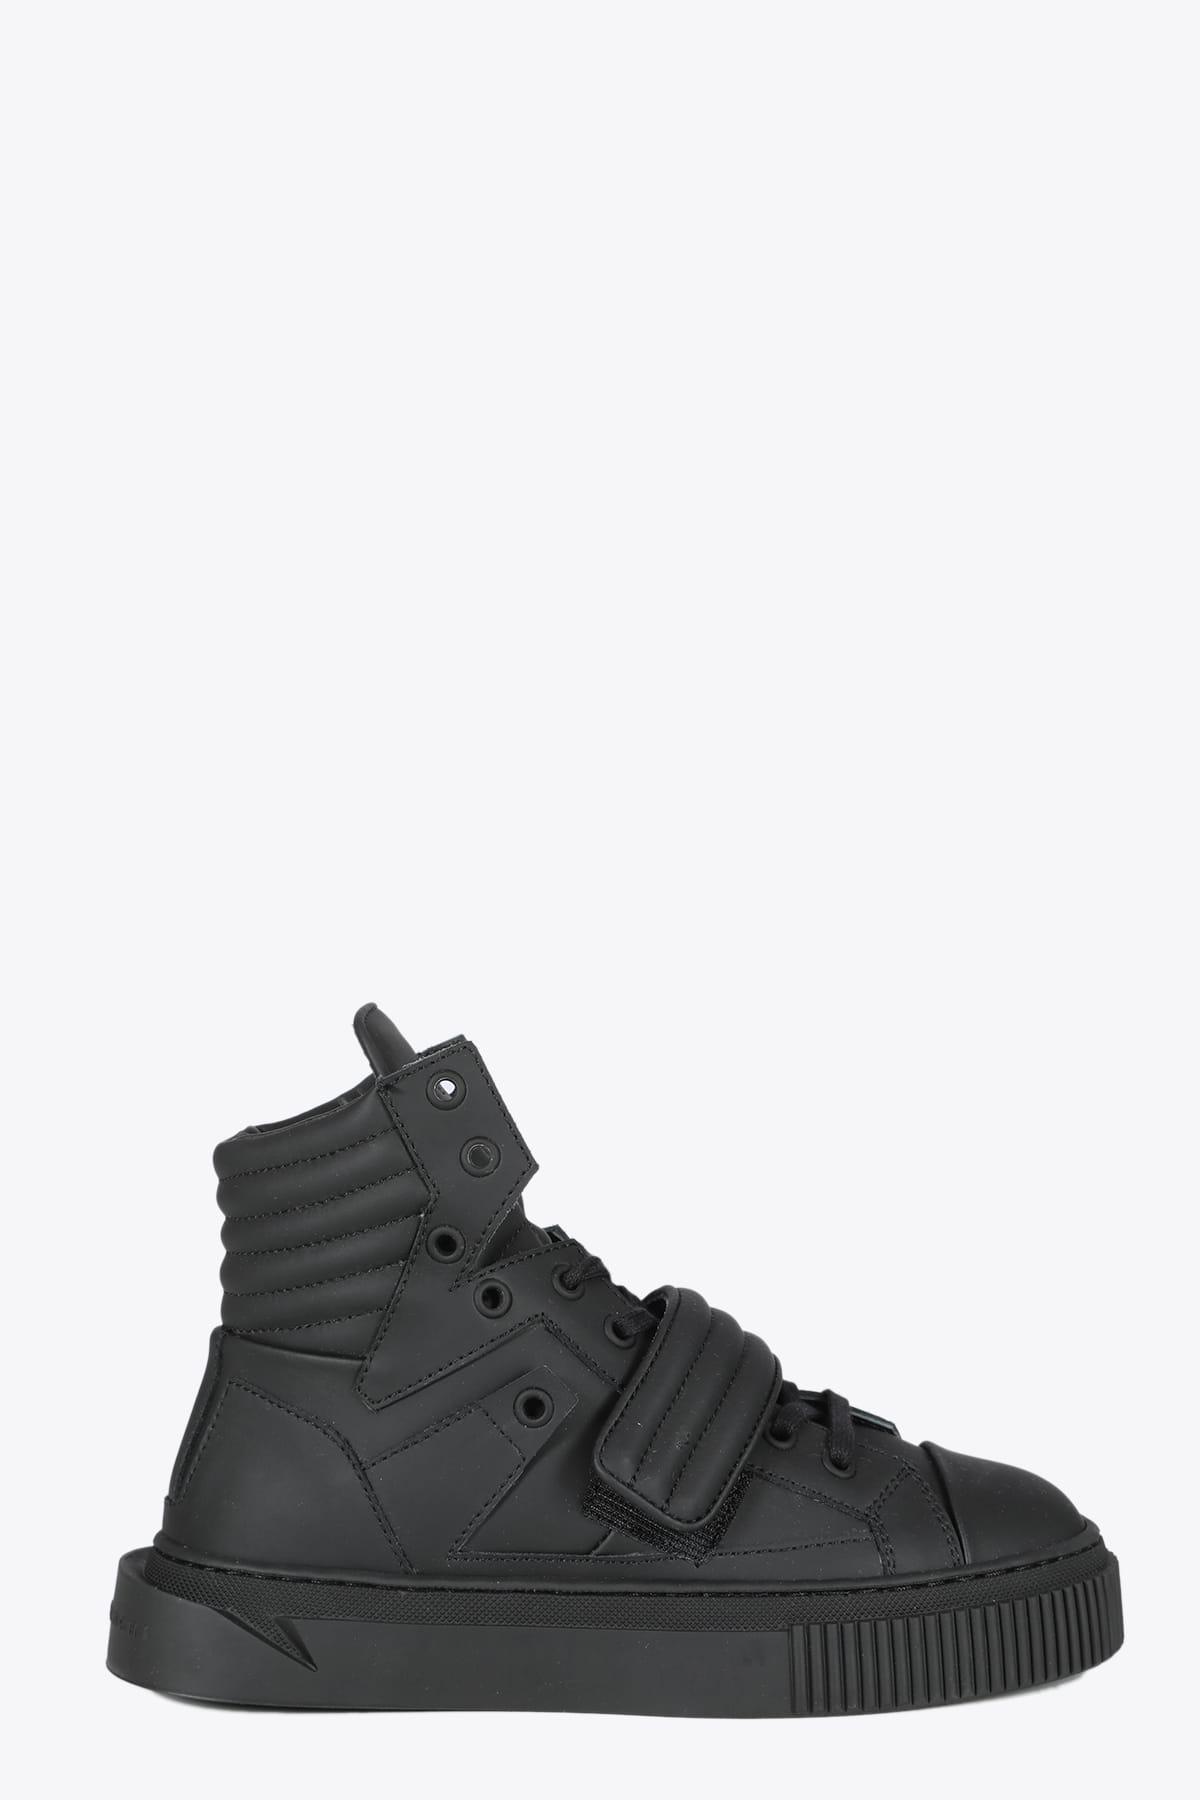 Hypnos Black Leather Sneaker